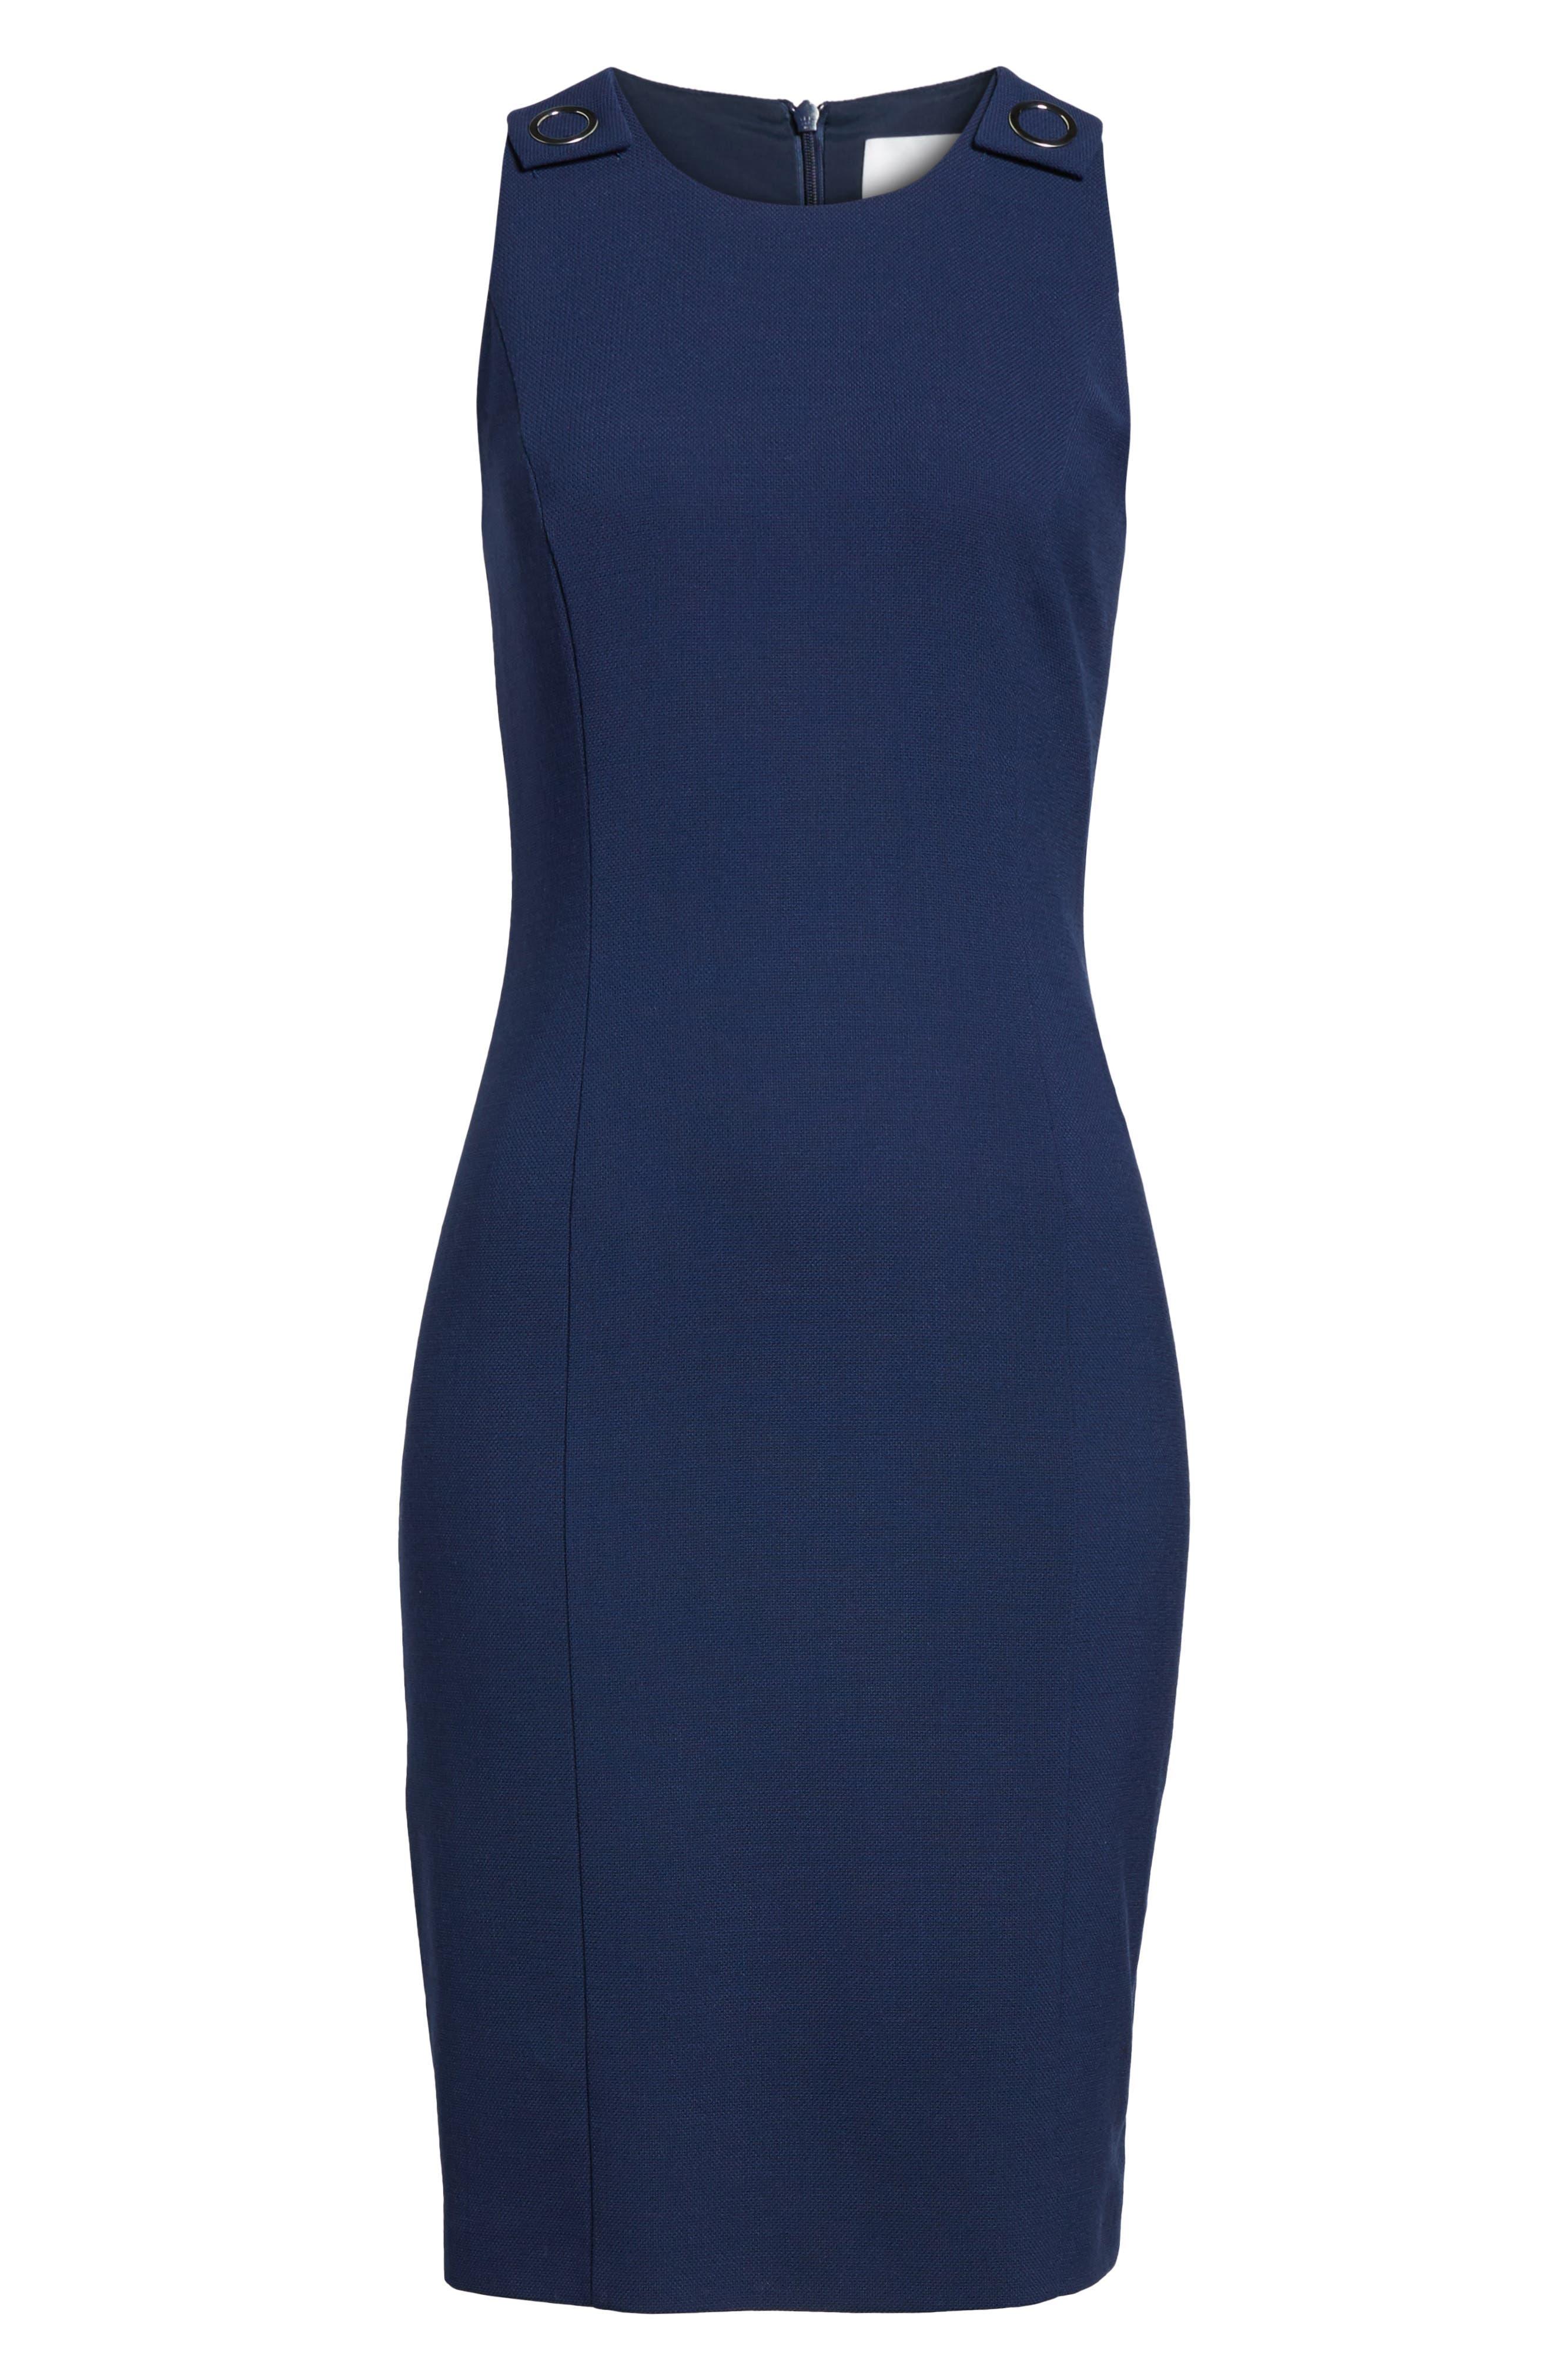 Dibalena Texture Stretch Dress,                             Alternate thumbnail 6, color,                             Nautical